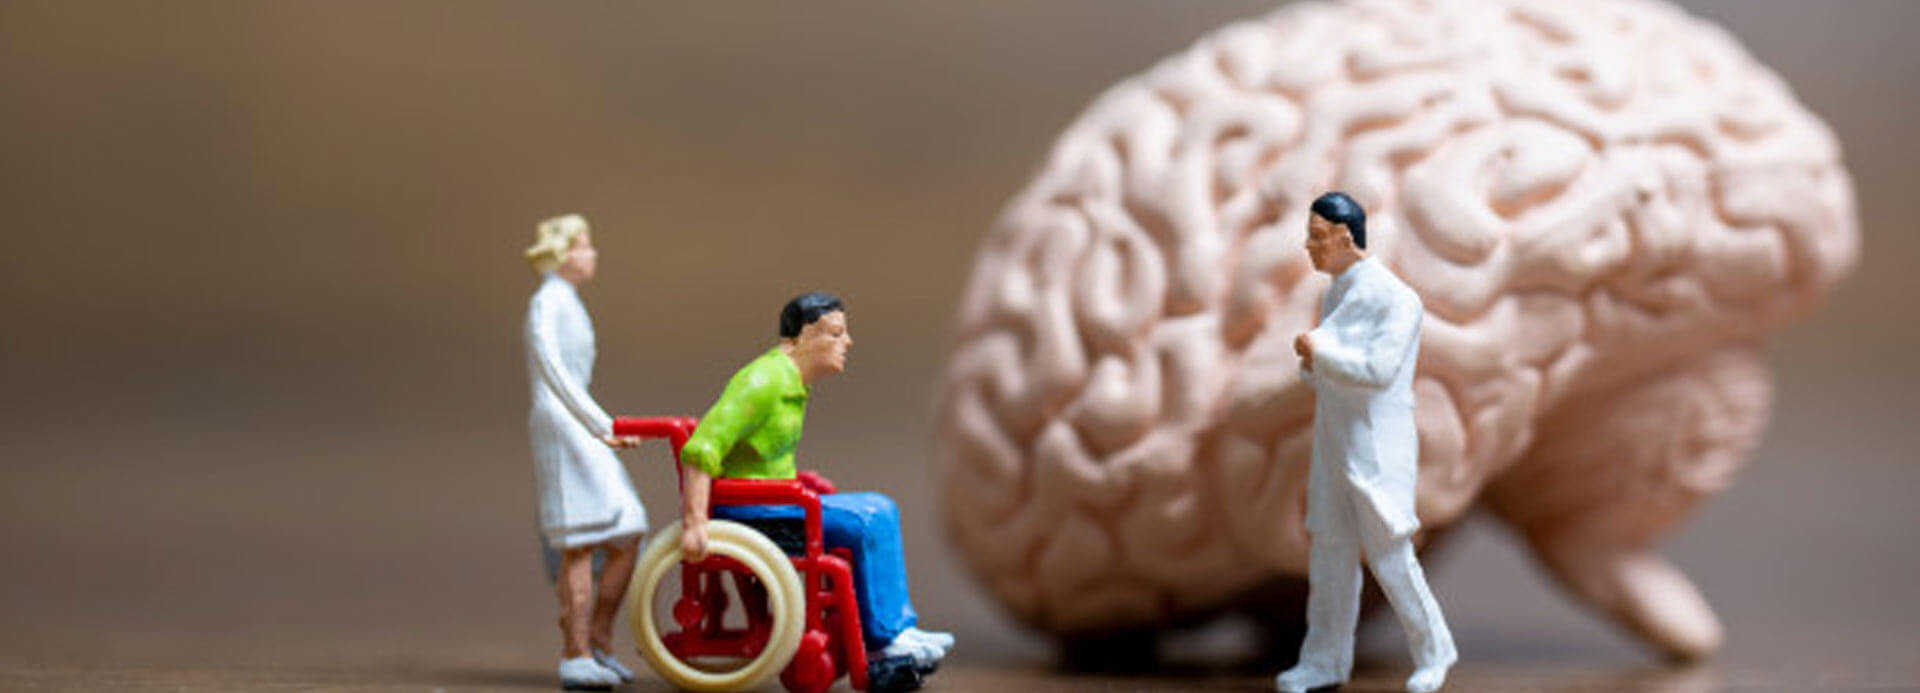 brain injury The Law office of John Vermon Moore